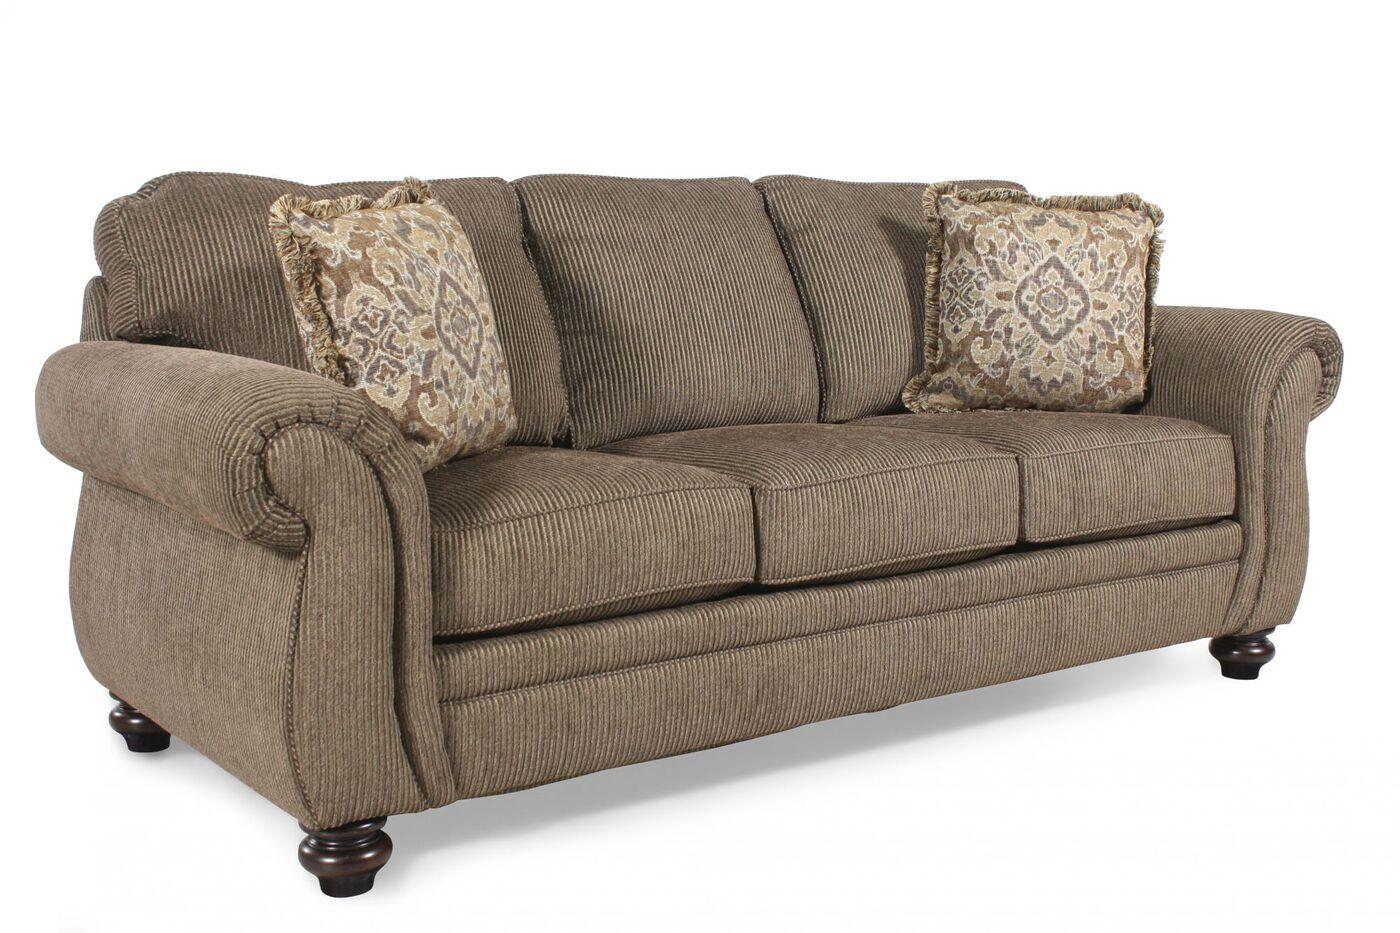 corduroy 89 queen sleeper sofa in teak mathis brothers furniture. Black Bedroom Furniture Sets. Home Design Ideas